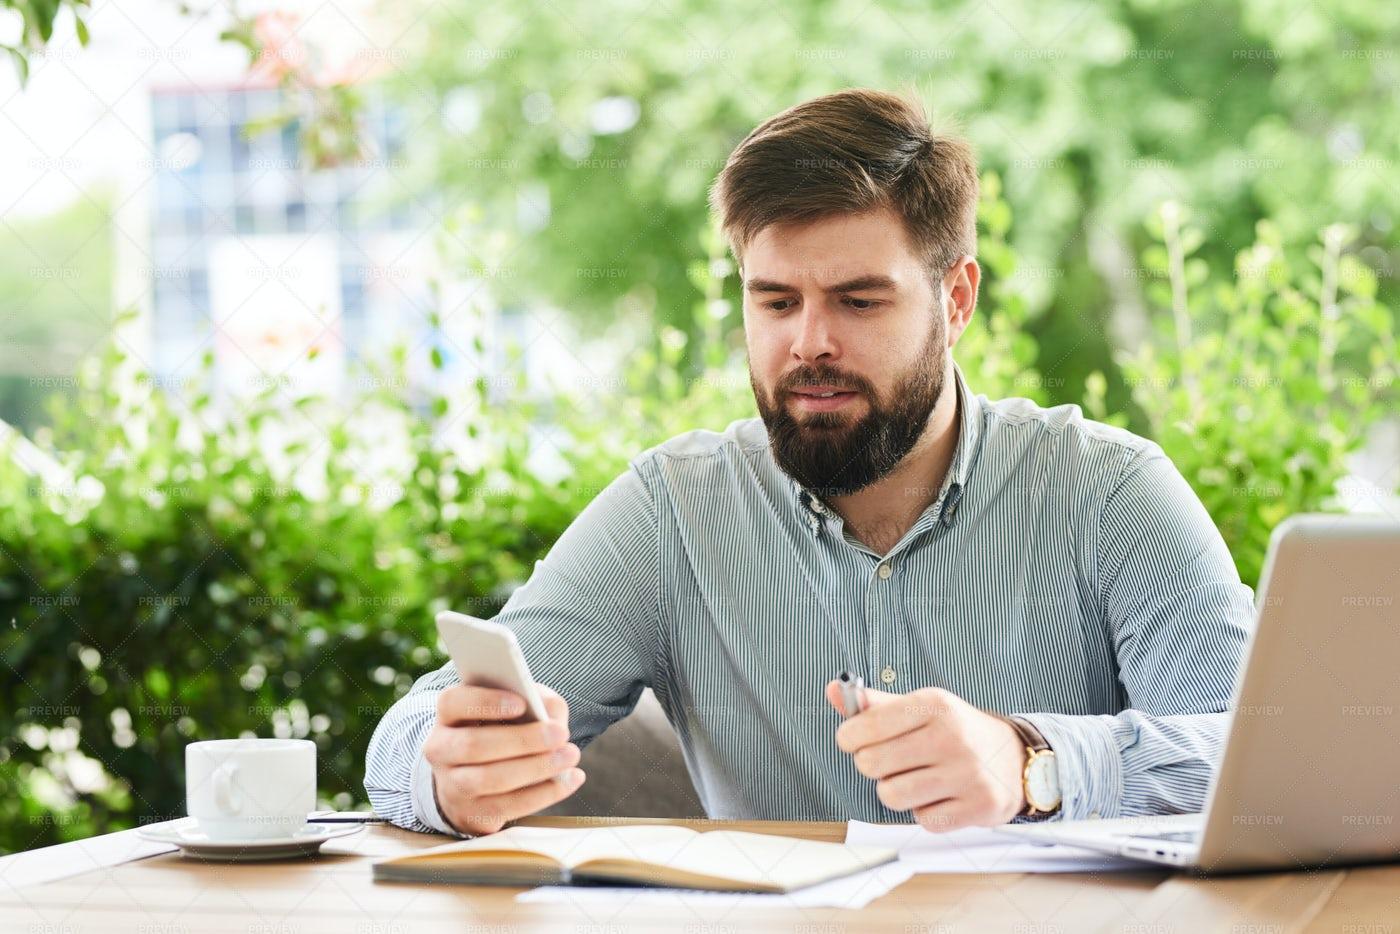 Businessman Using Smartphone For...: Stock Photos